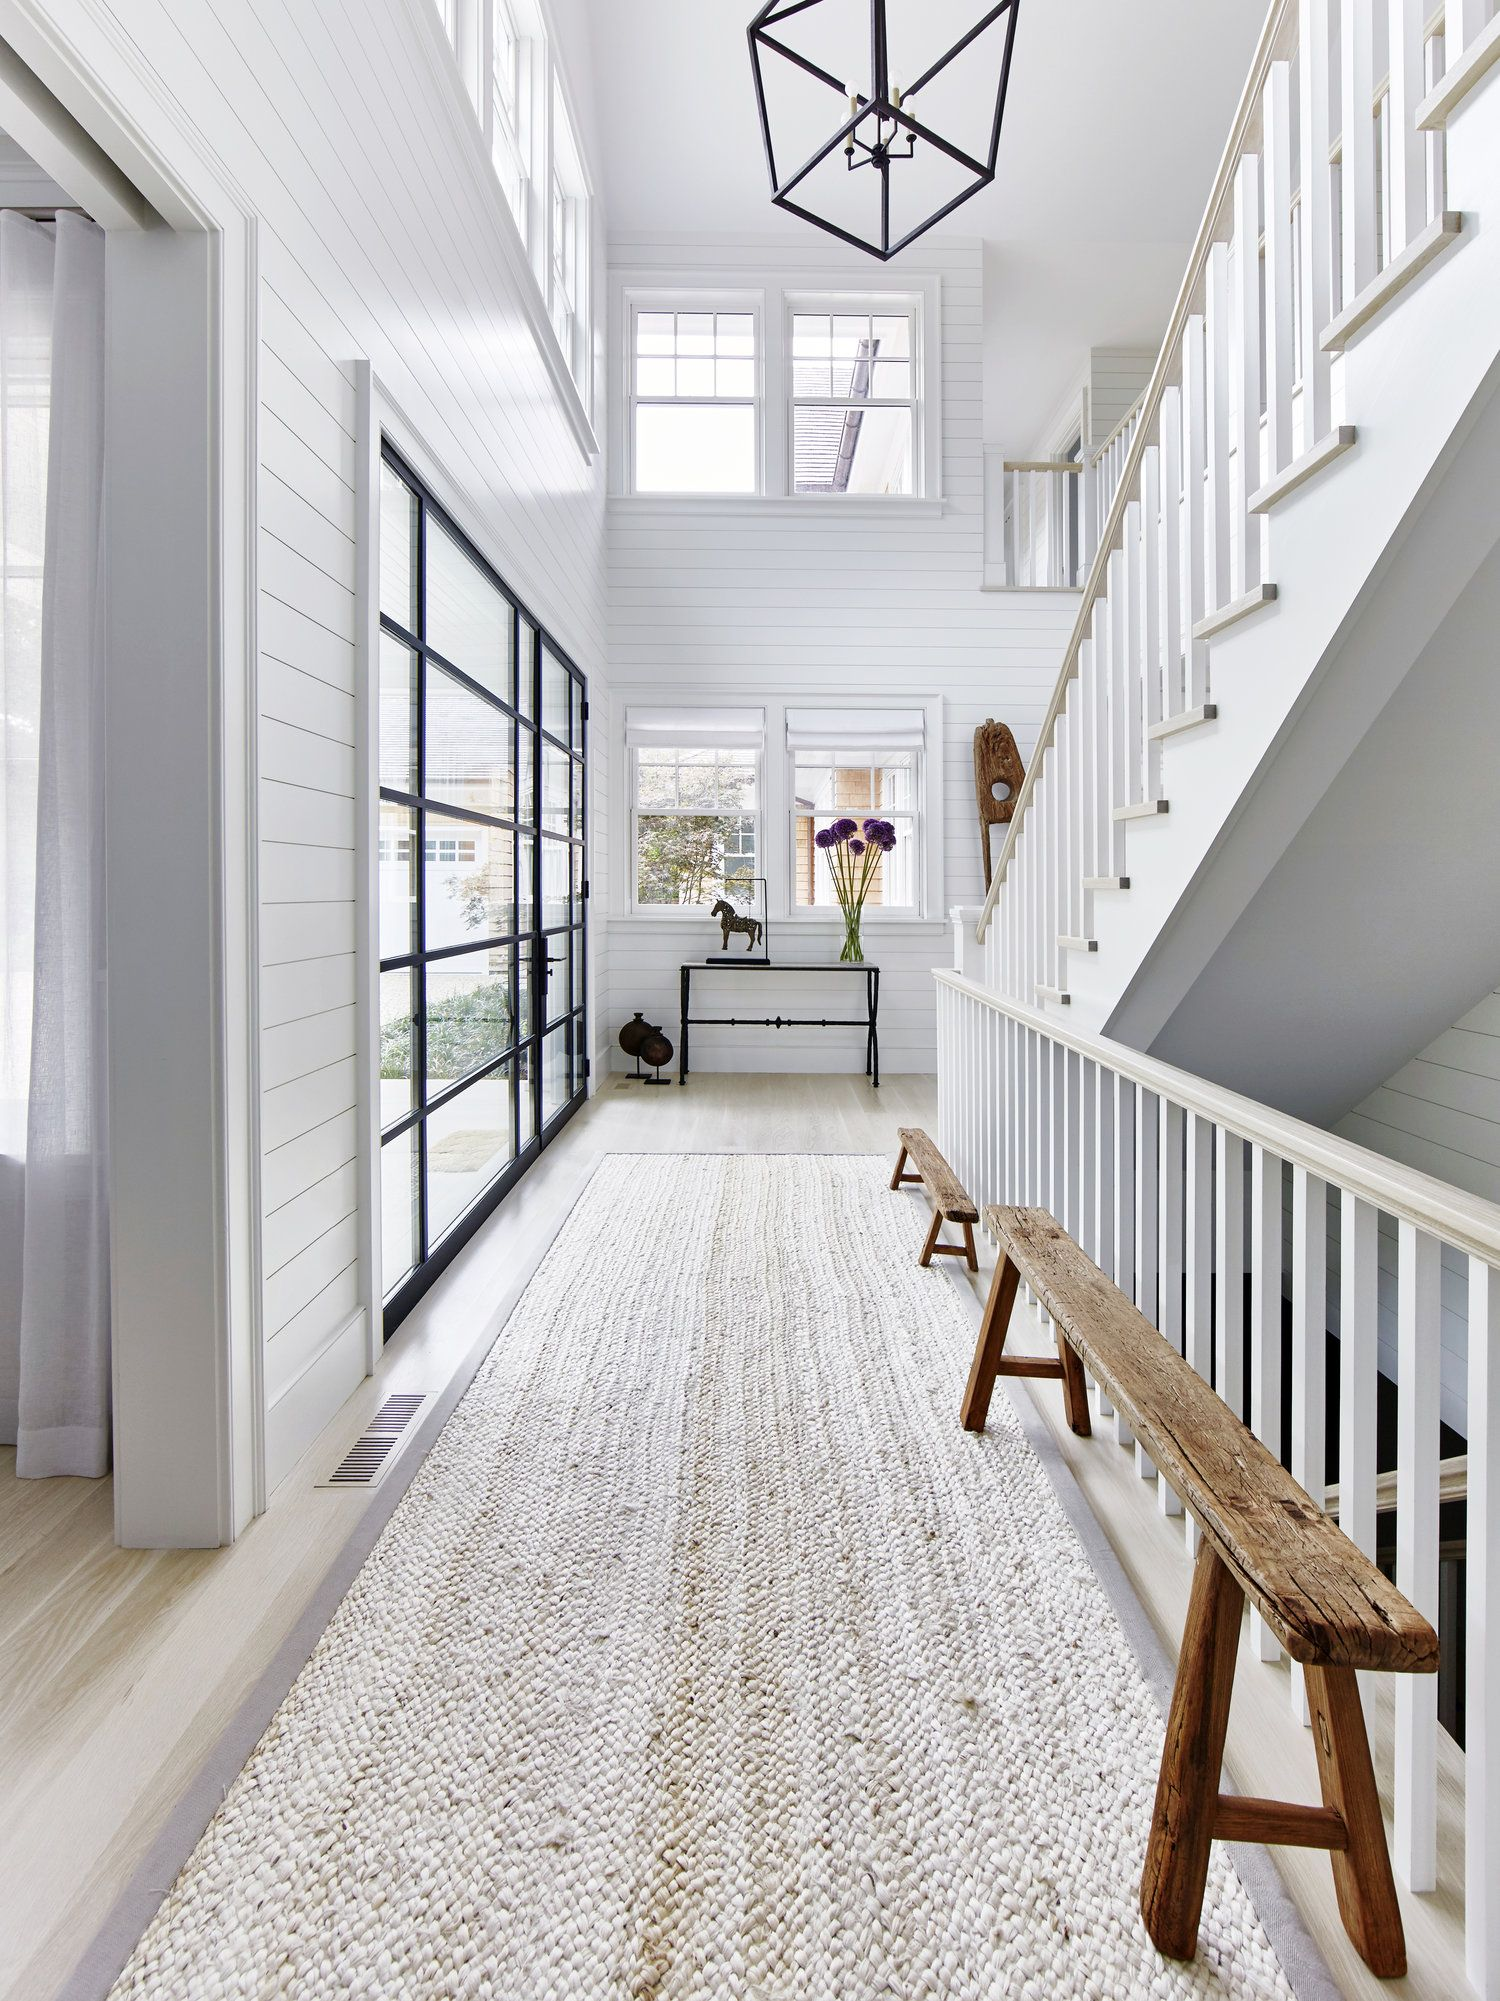 03. Amagansett Beach House by Chango & Co.jpg | Room Decor//Homes ...